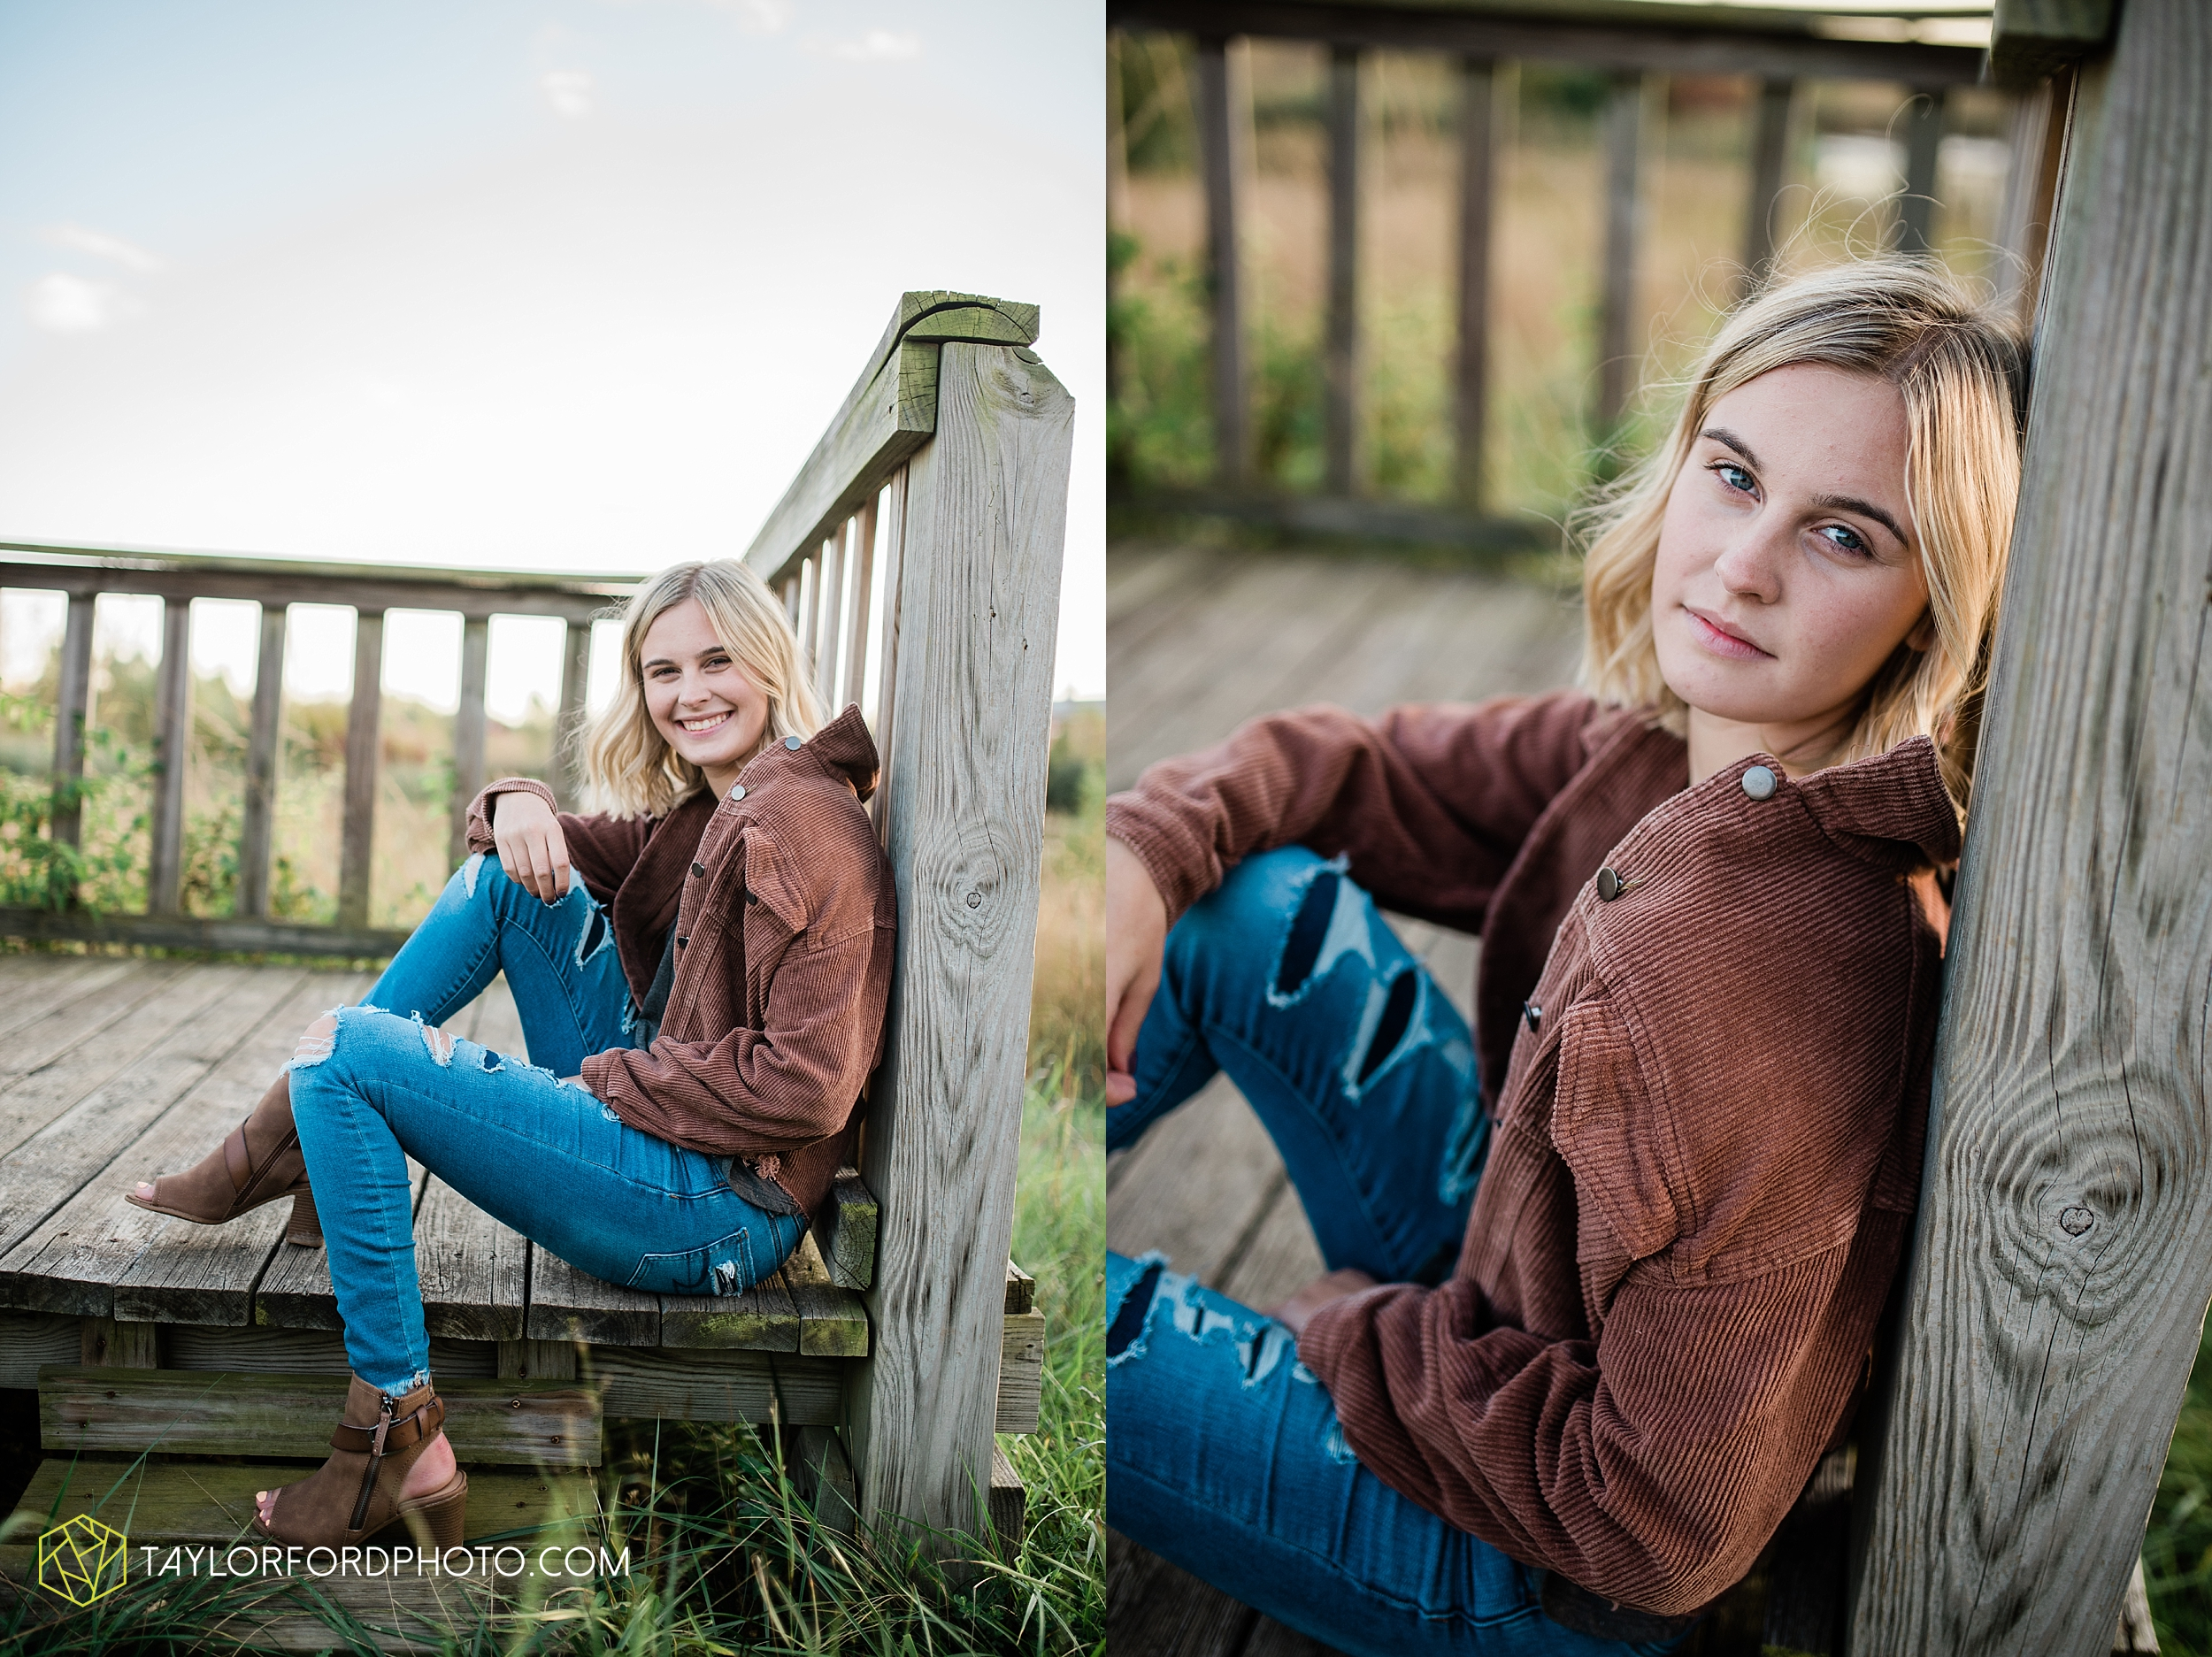 van-wert-high-school-ohio-senior-girl-downtown-cougar-photographer-taylor-ford-photography_0953.jpg